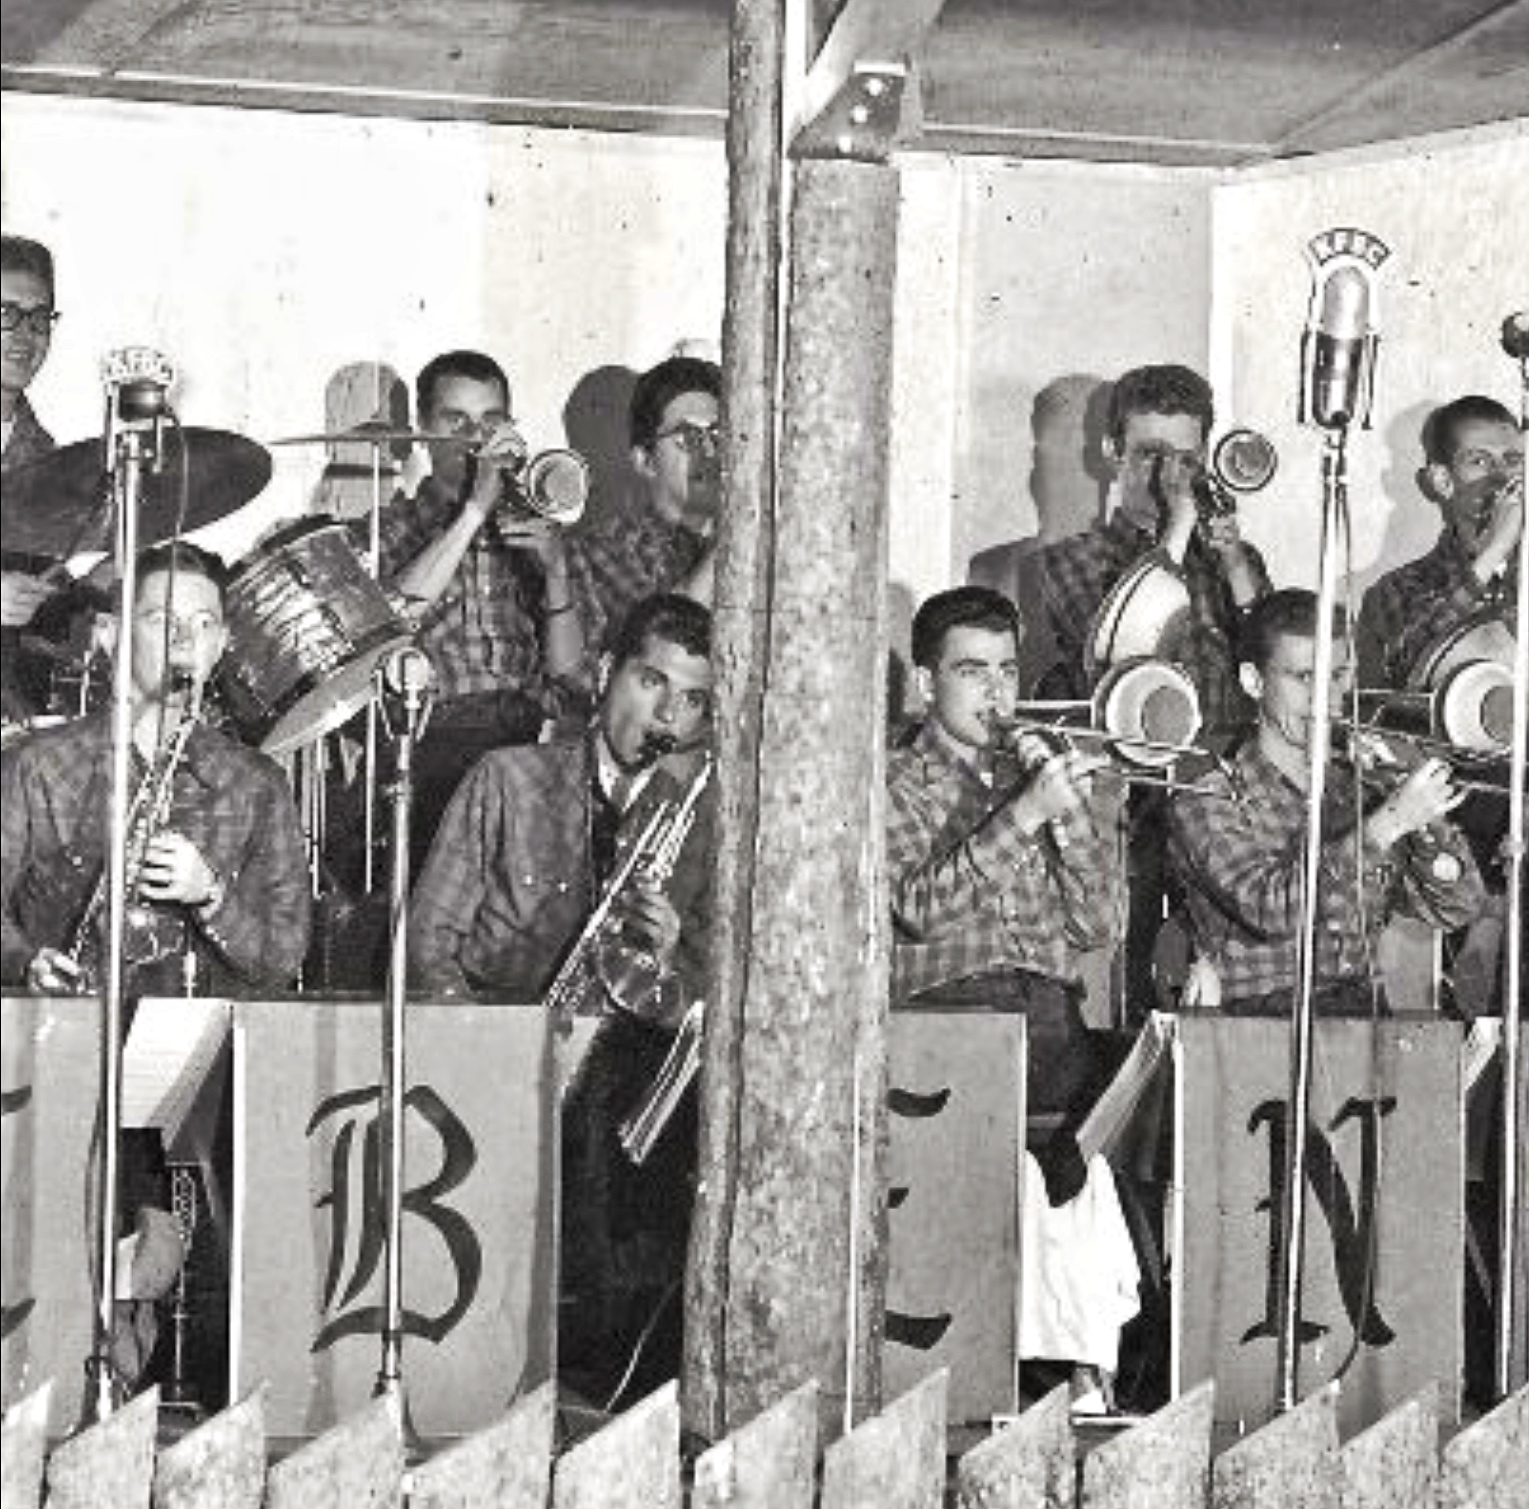 Benny Goodman and His Orchestra, Richard Nash, and Gene Cipriano